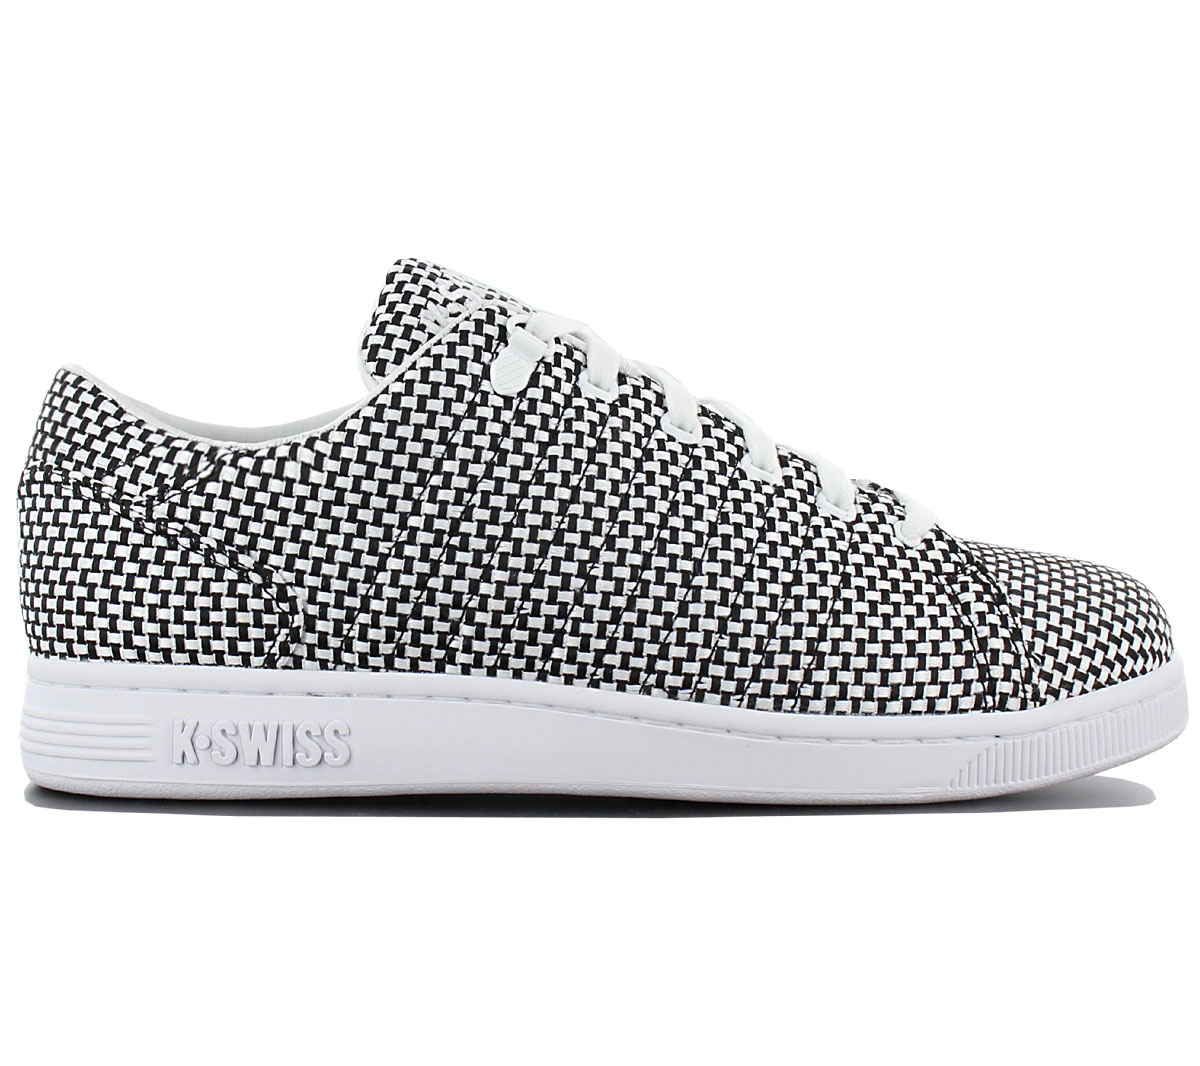 5e53b83fe6c K-Swiss Lozan 3 Tt Tongue Twister Woven Men's Sneakers Shoes Textile ...